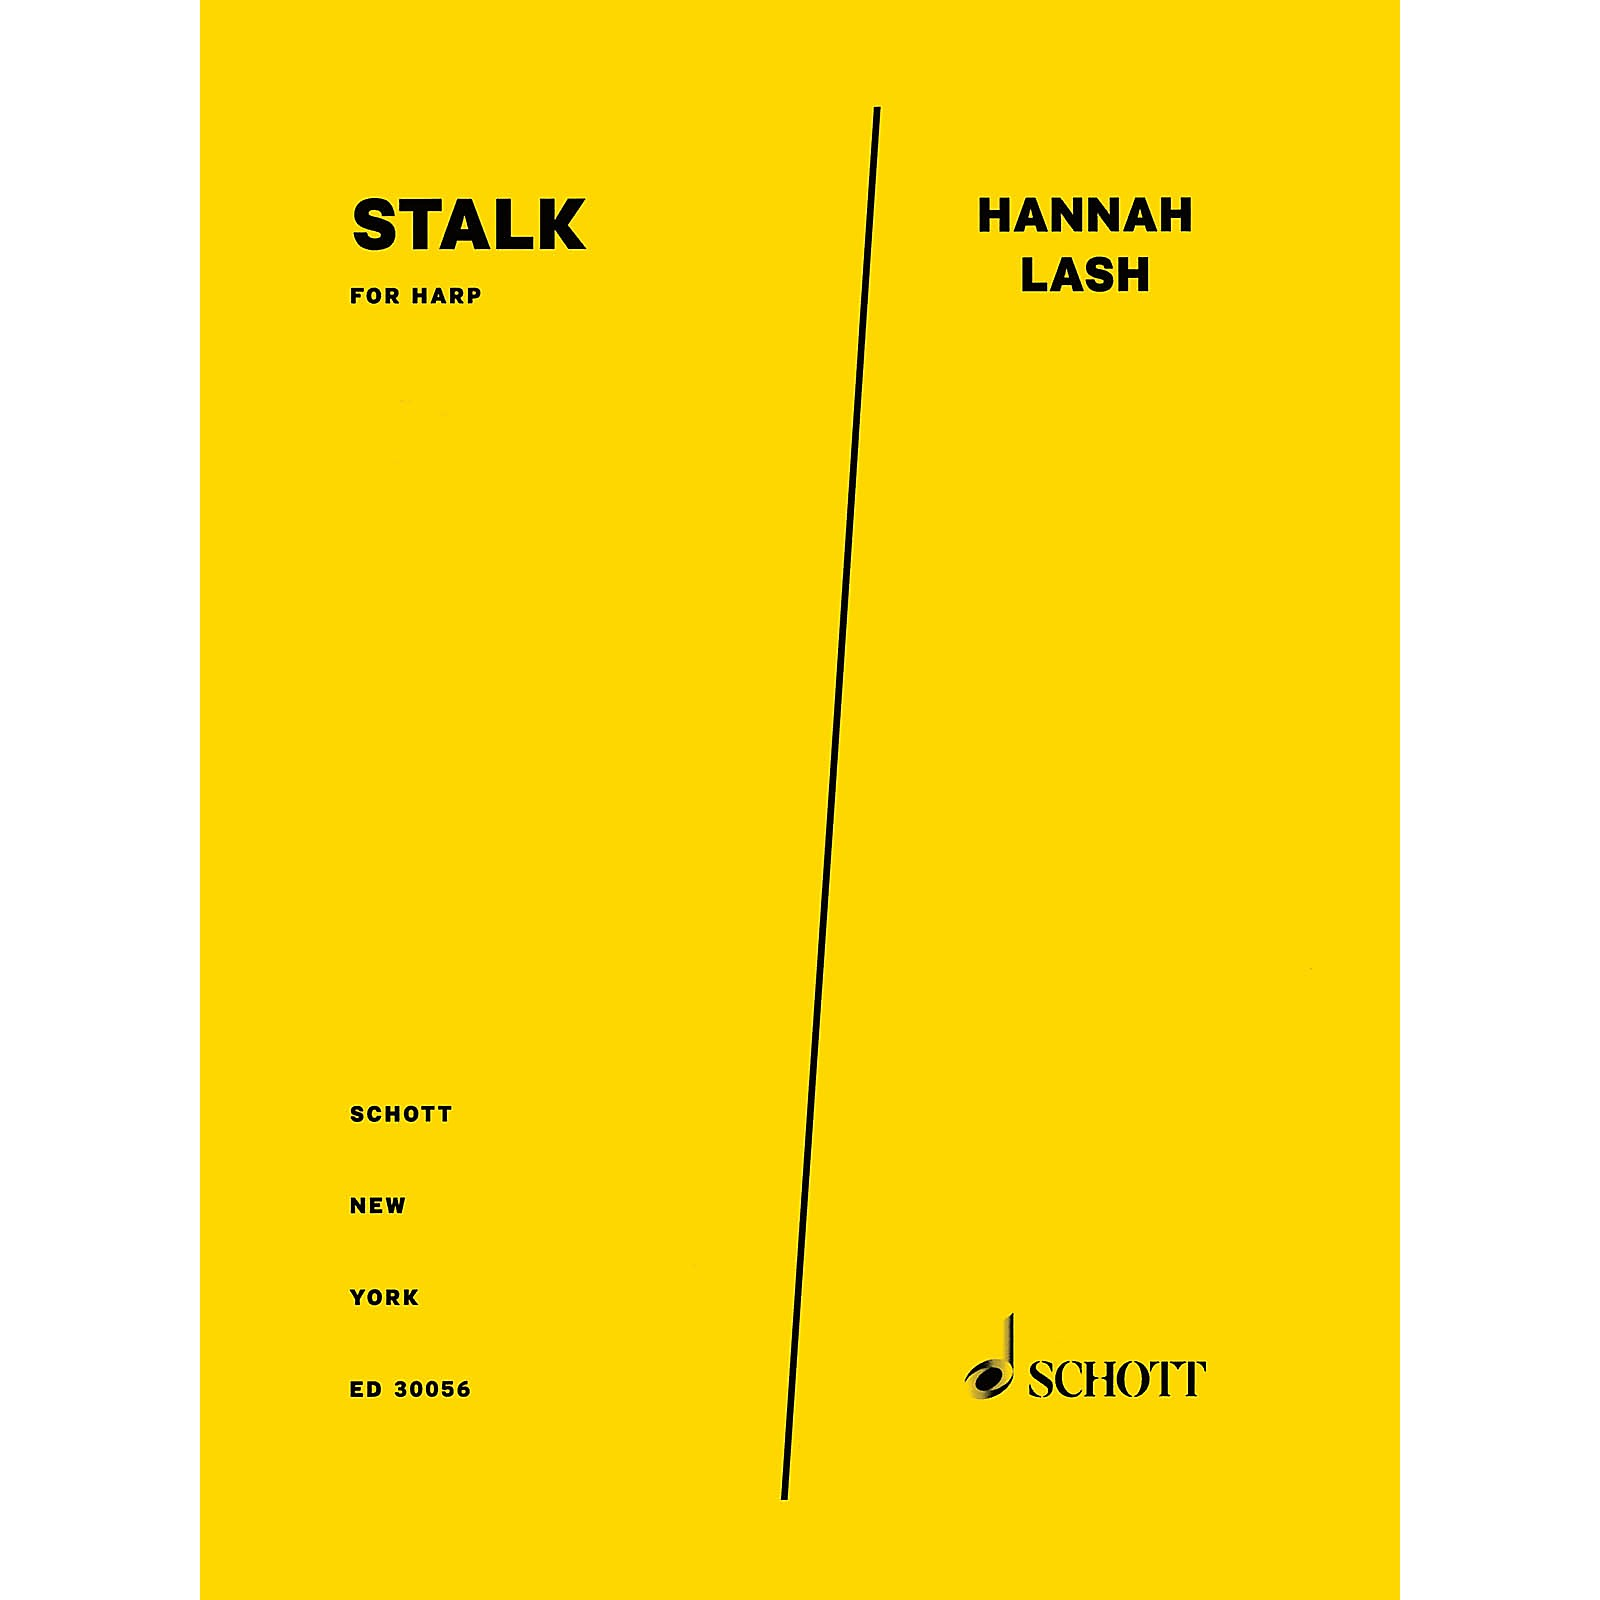 Schott Music Corporation New York Stalk (for Harp) Instrumental Solo Series